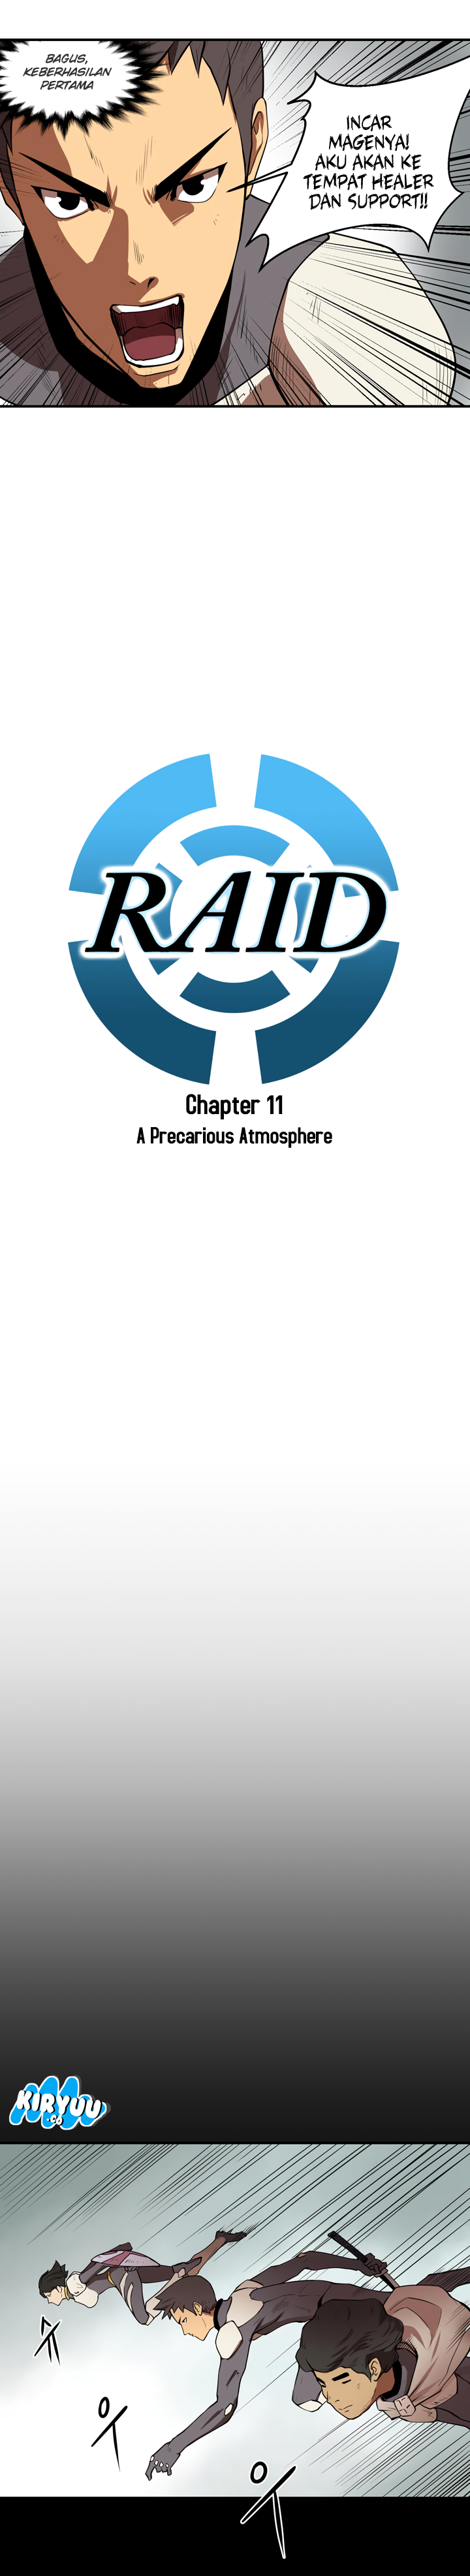 Raid Chapter 11